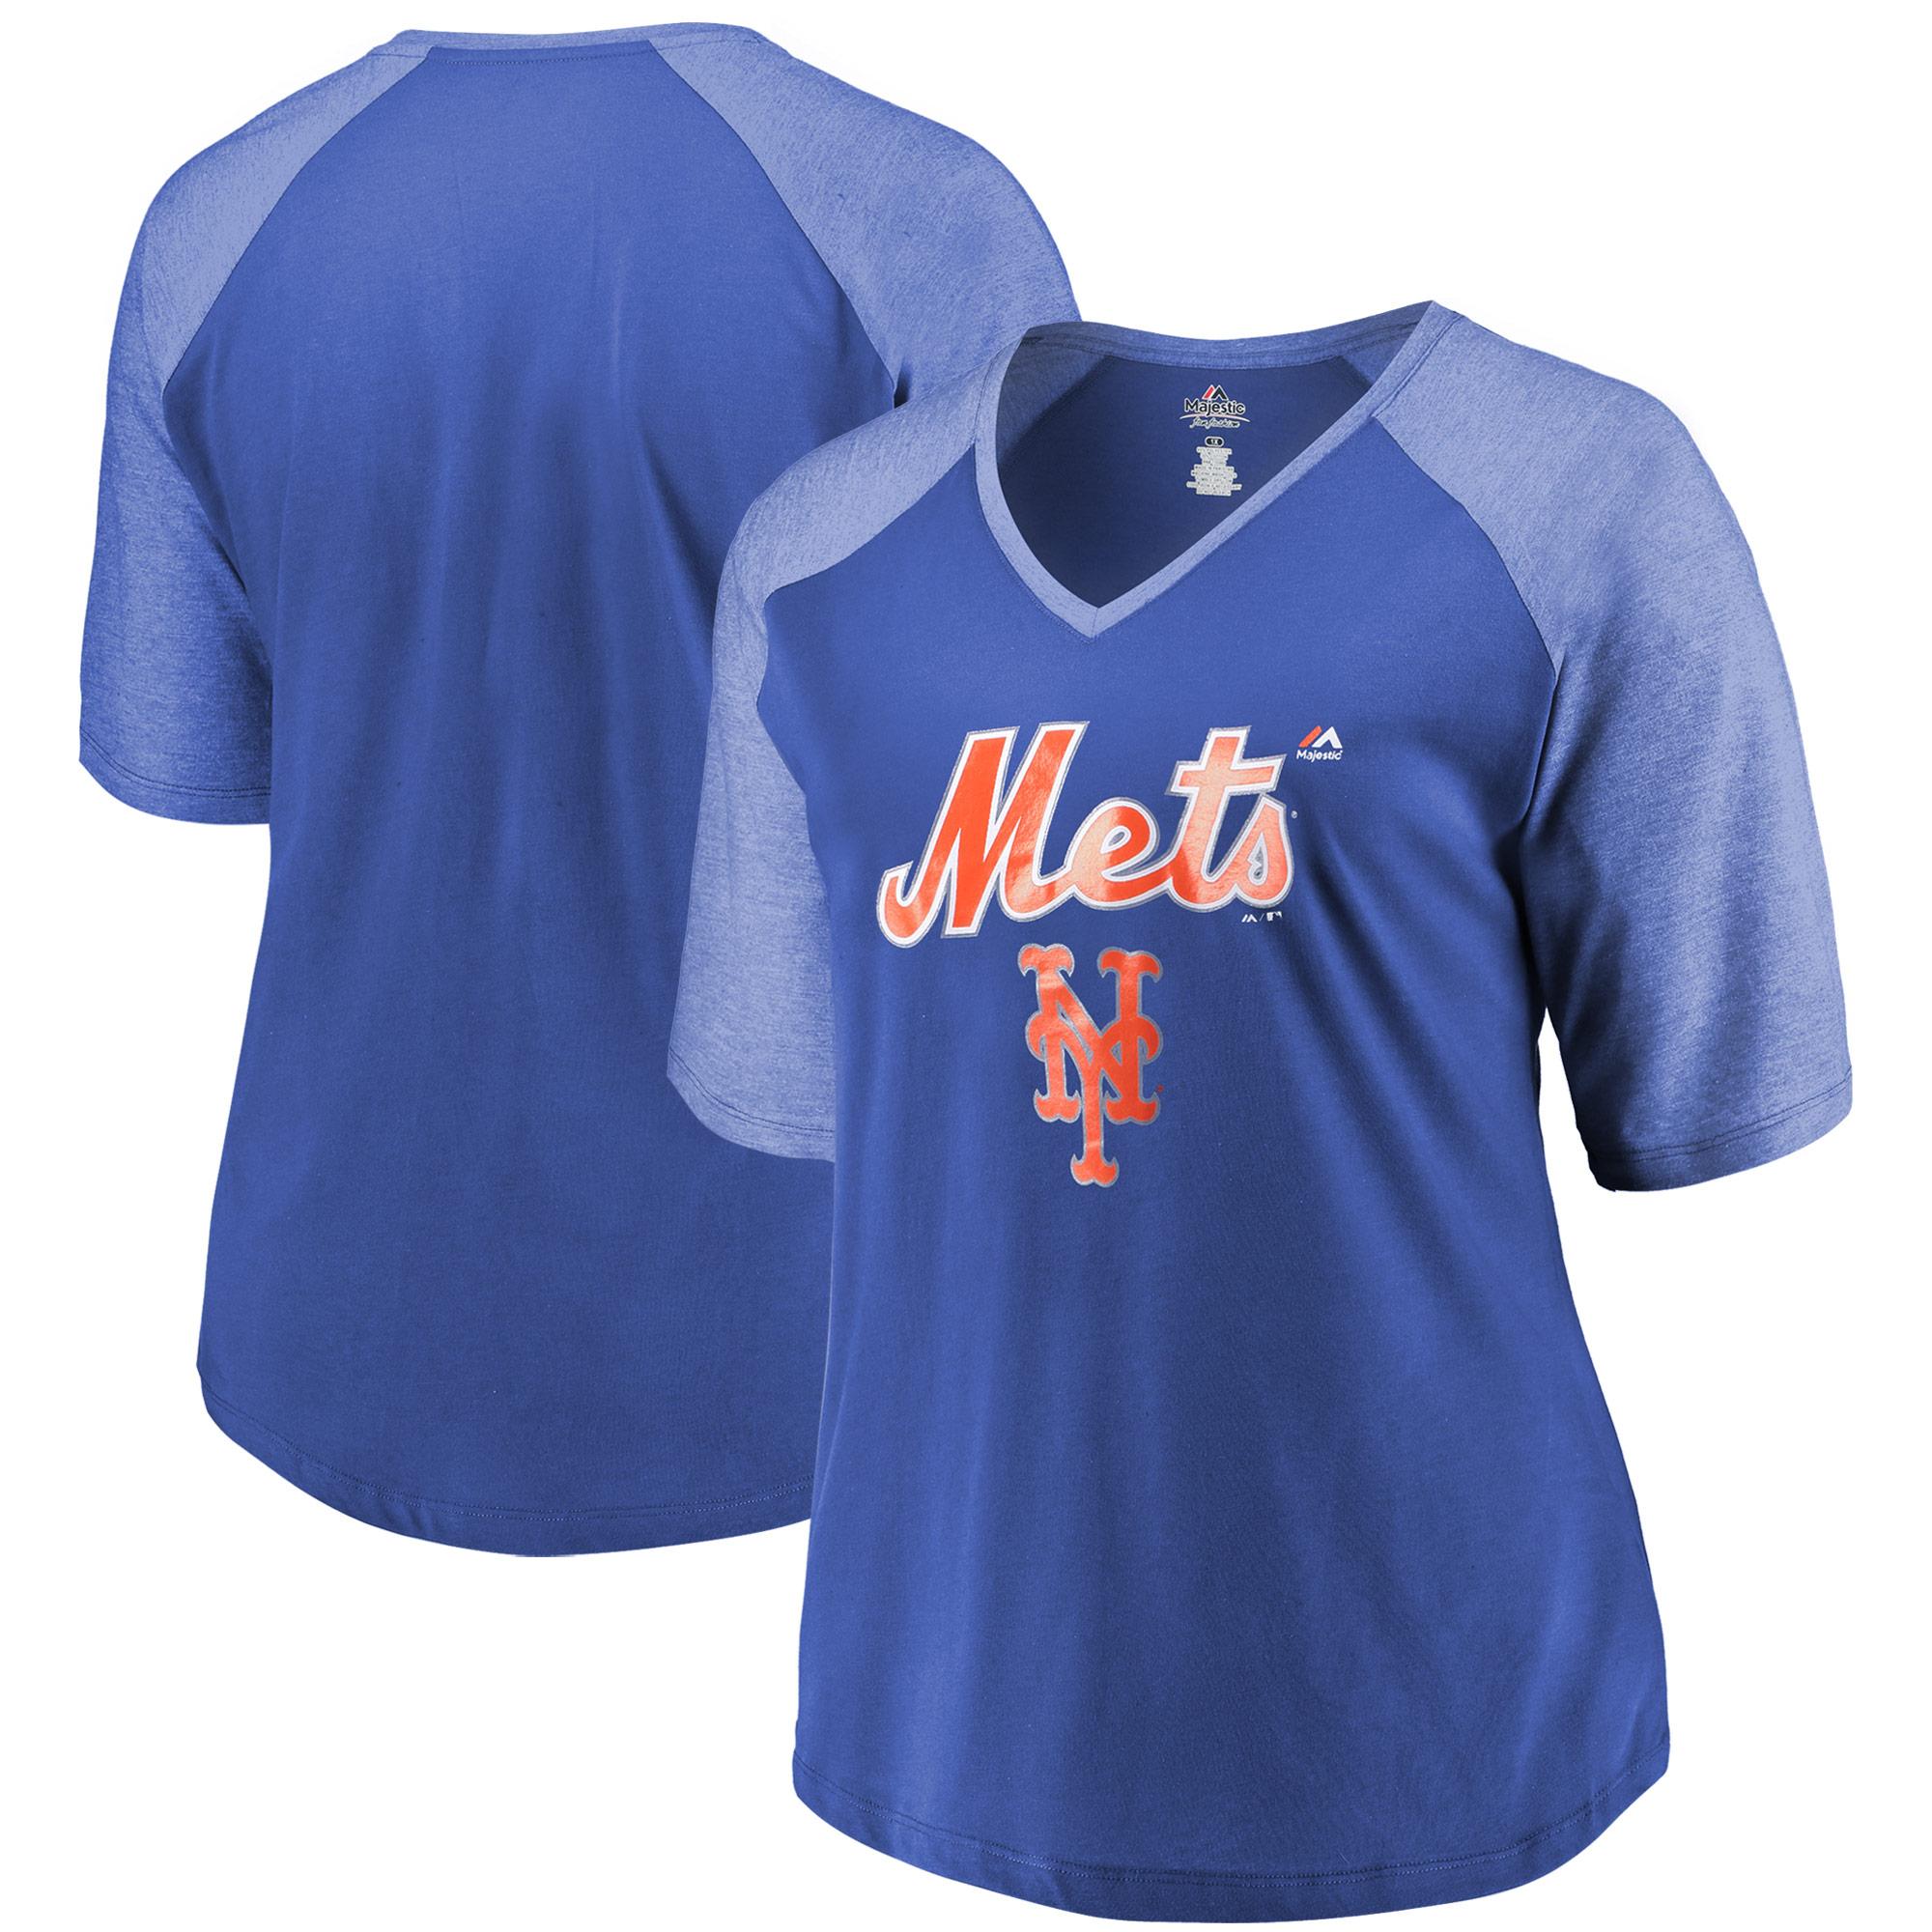 New York Mets Majestic Women's Plus Size Half Sleeve V-Neck T-Shirt - Royal